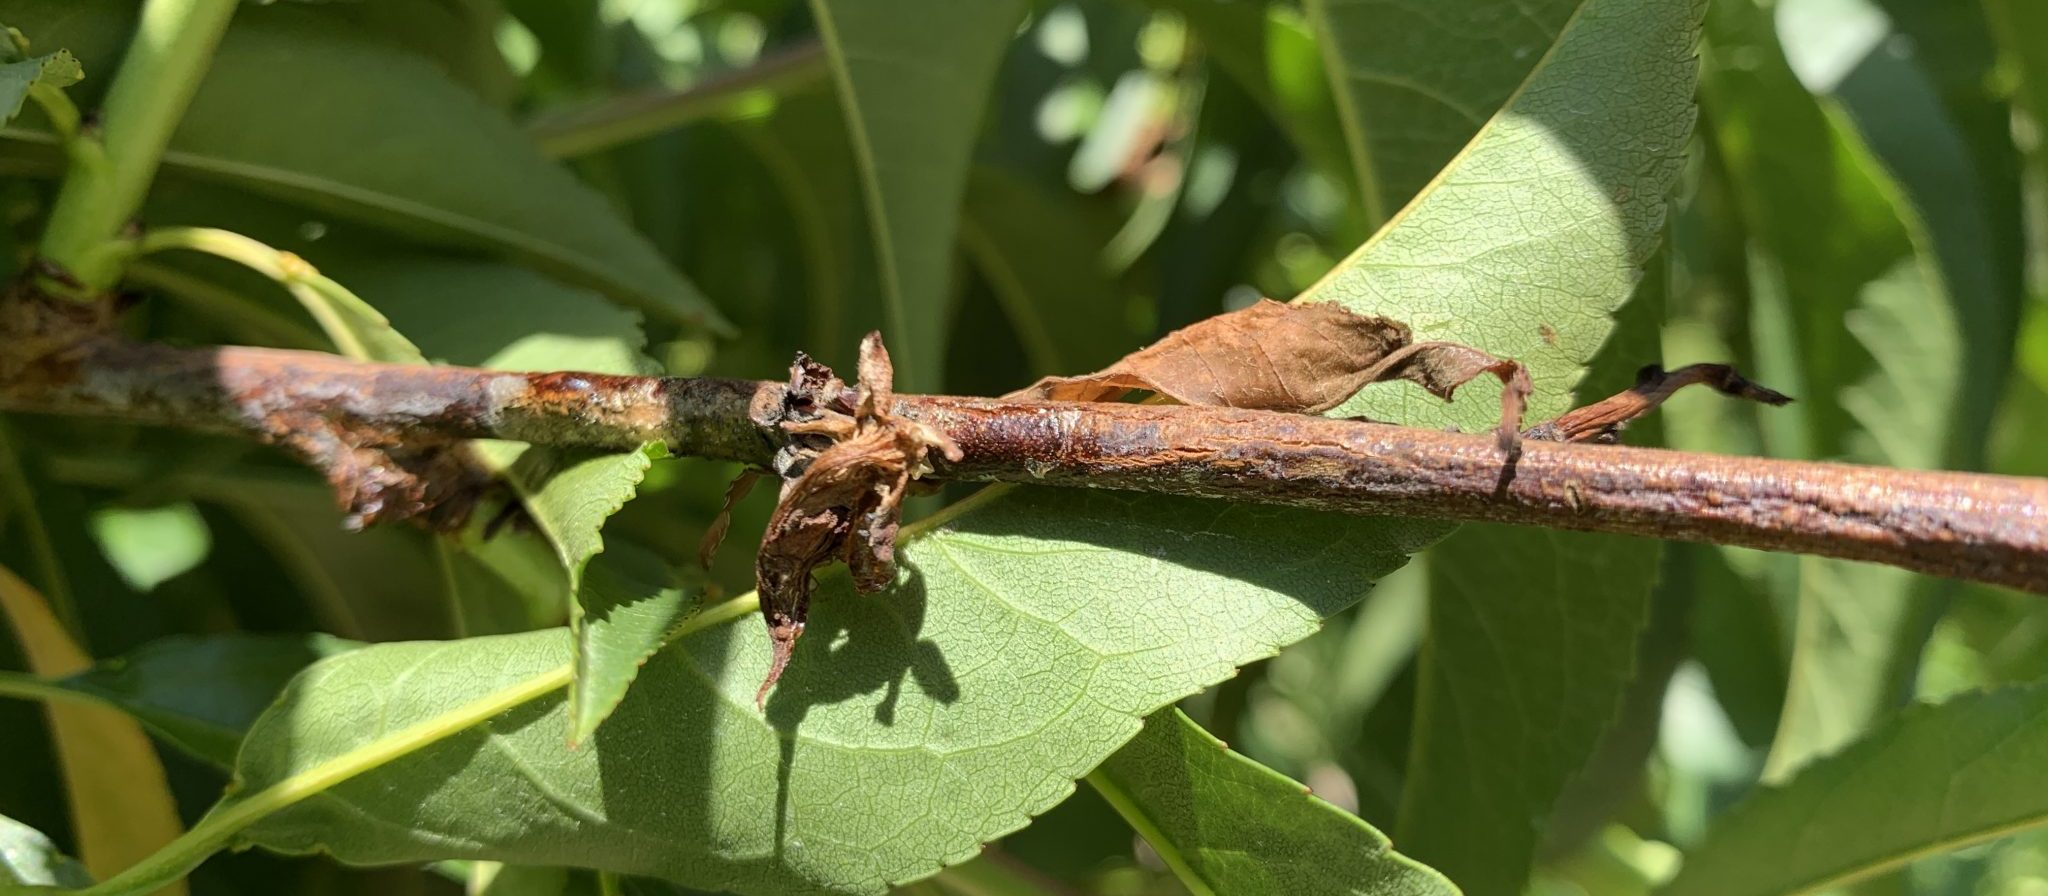 Phomopsis twig blight